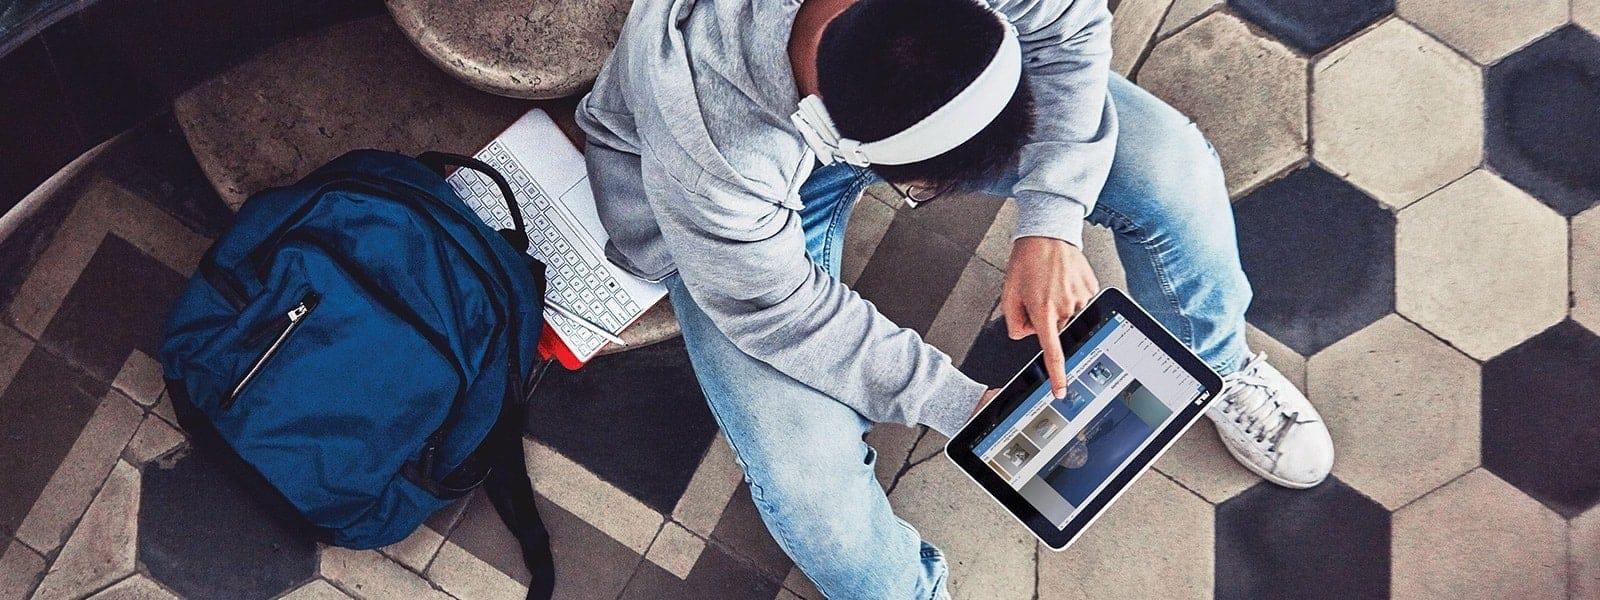 Étudiant qui regarde un appareil Windows10